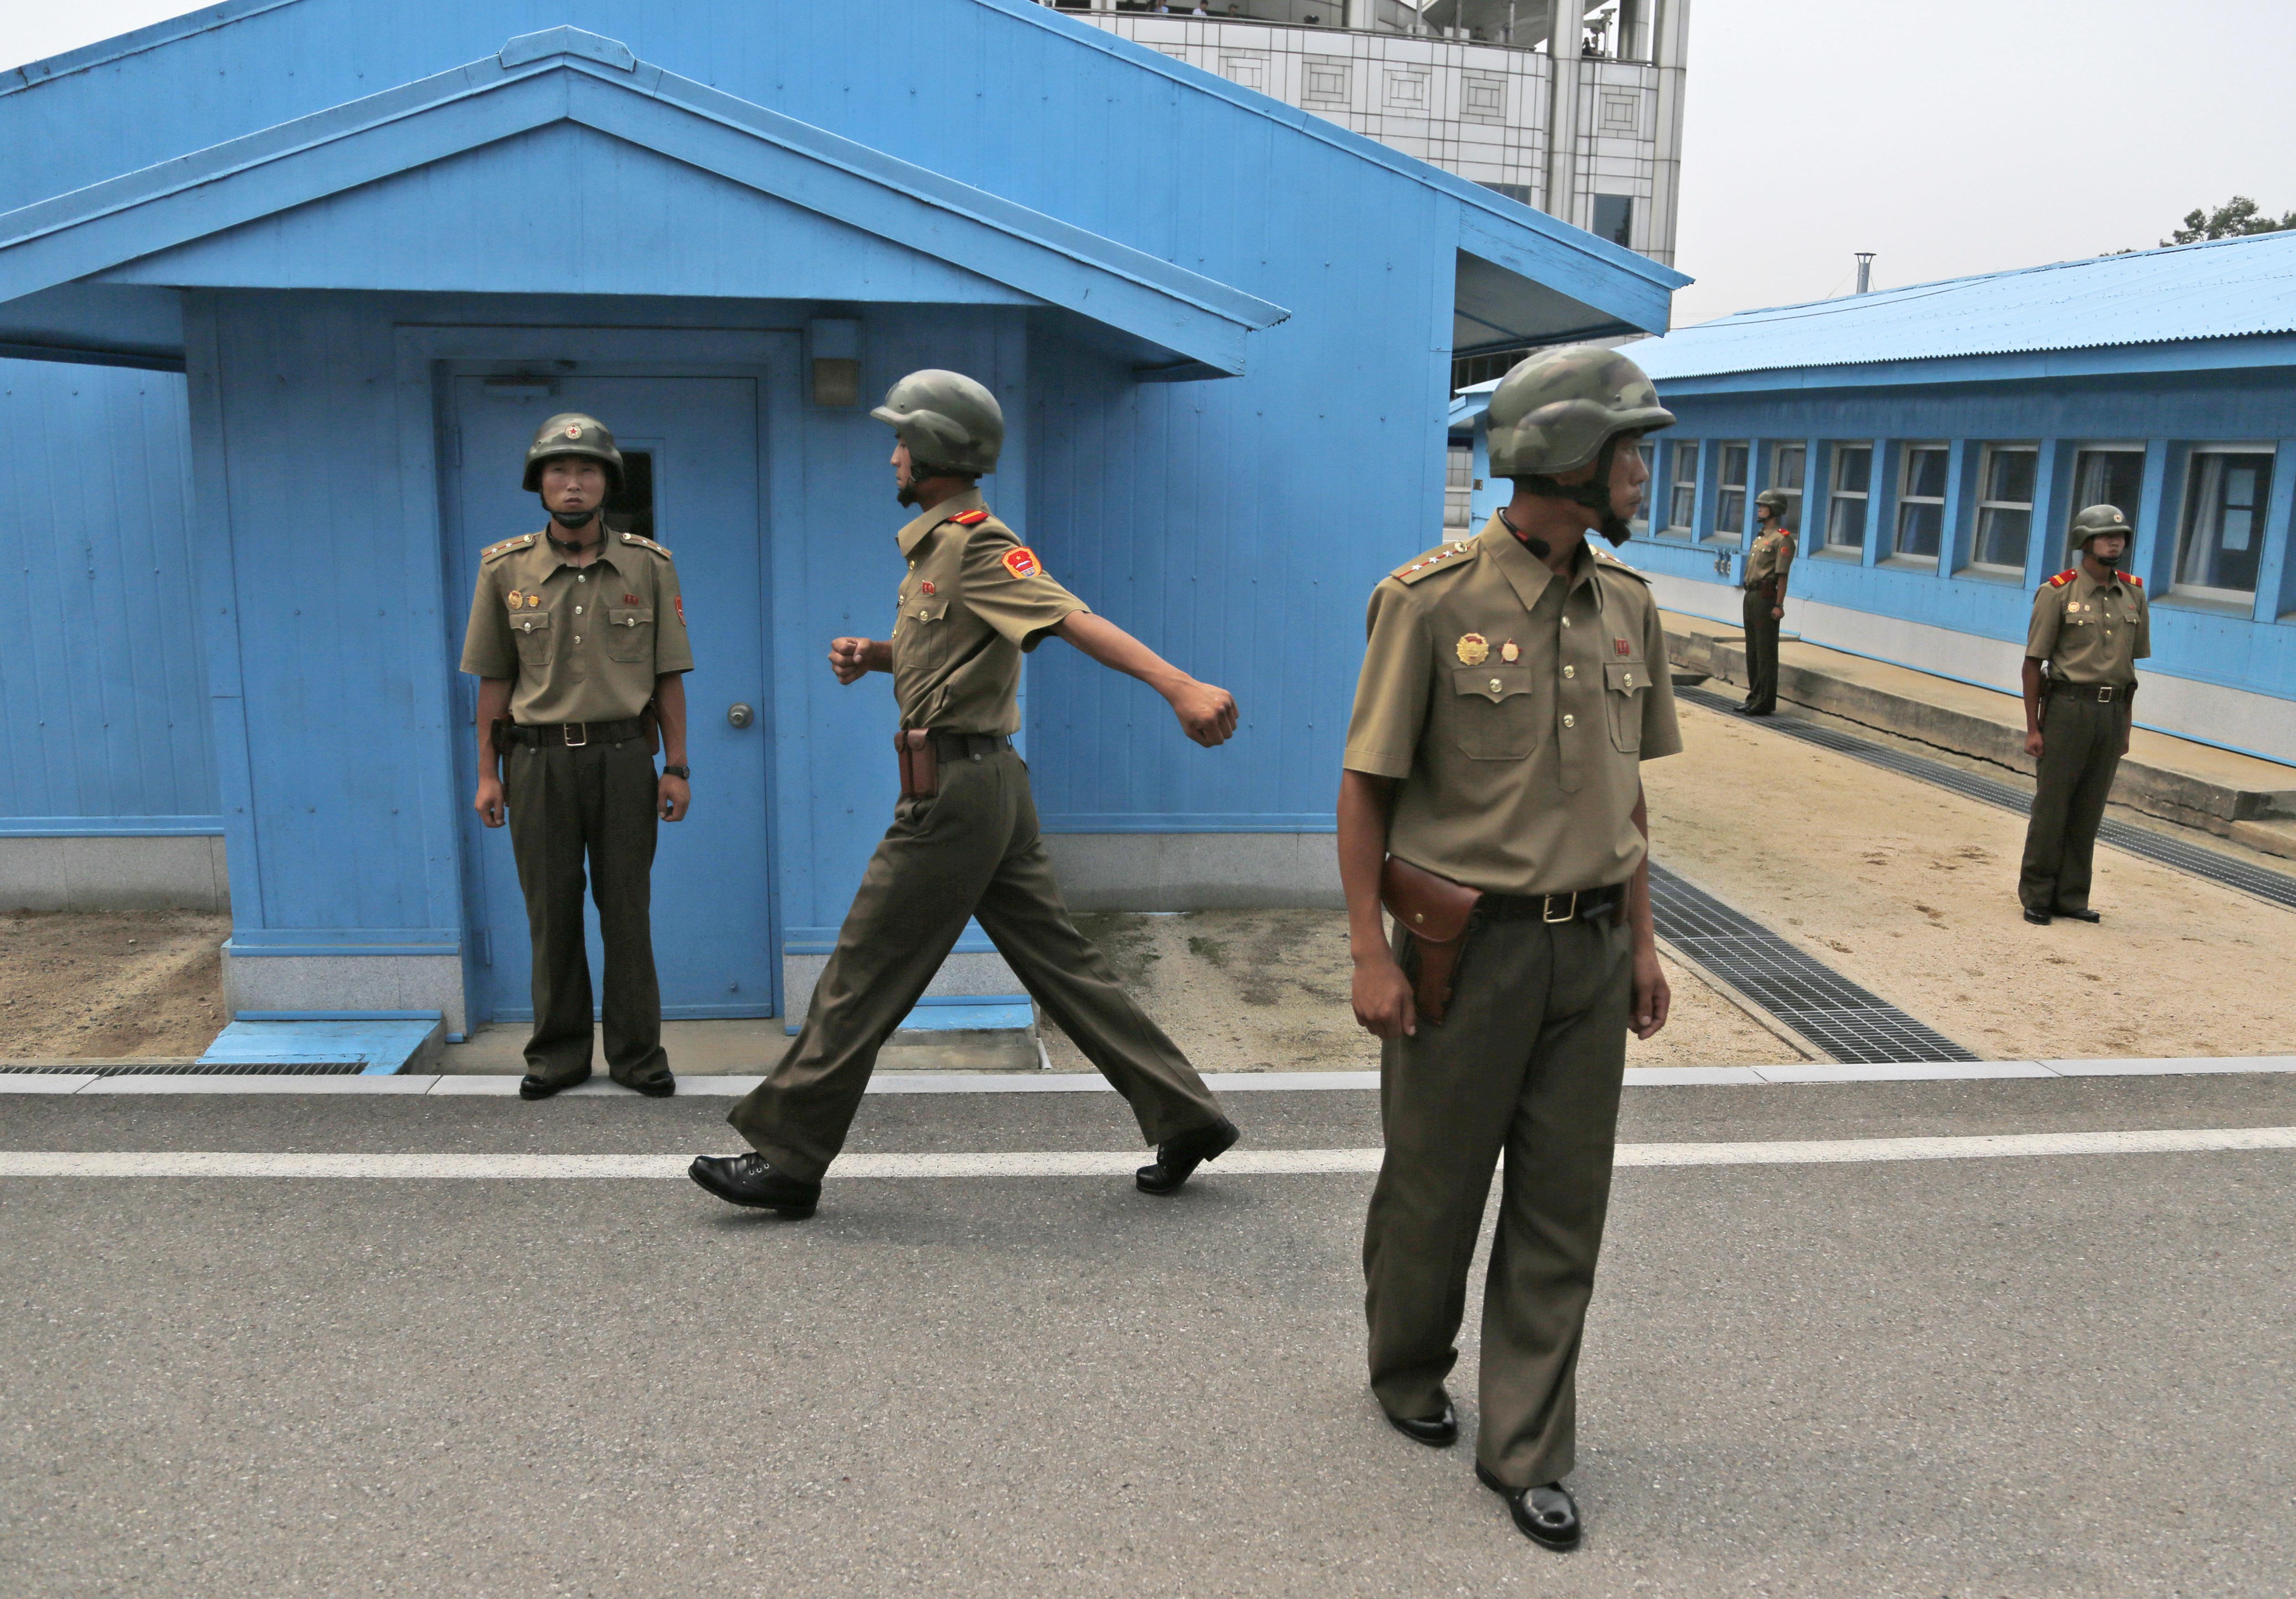 Donald Trump's Asia trip to skip Korean Demilitarized Zone